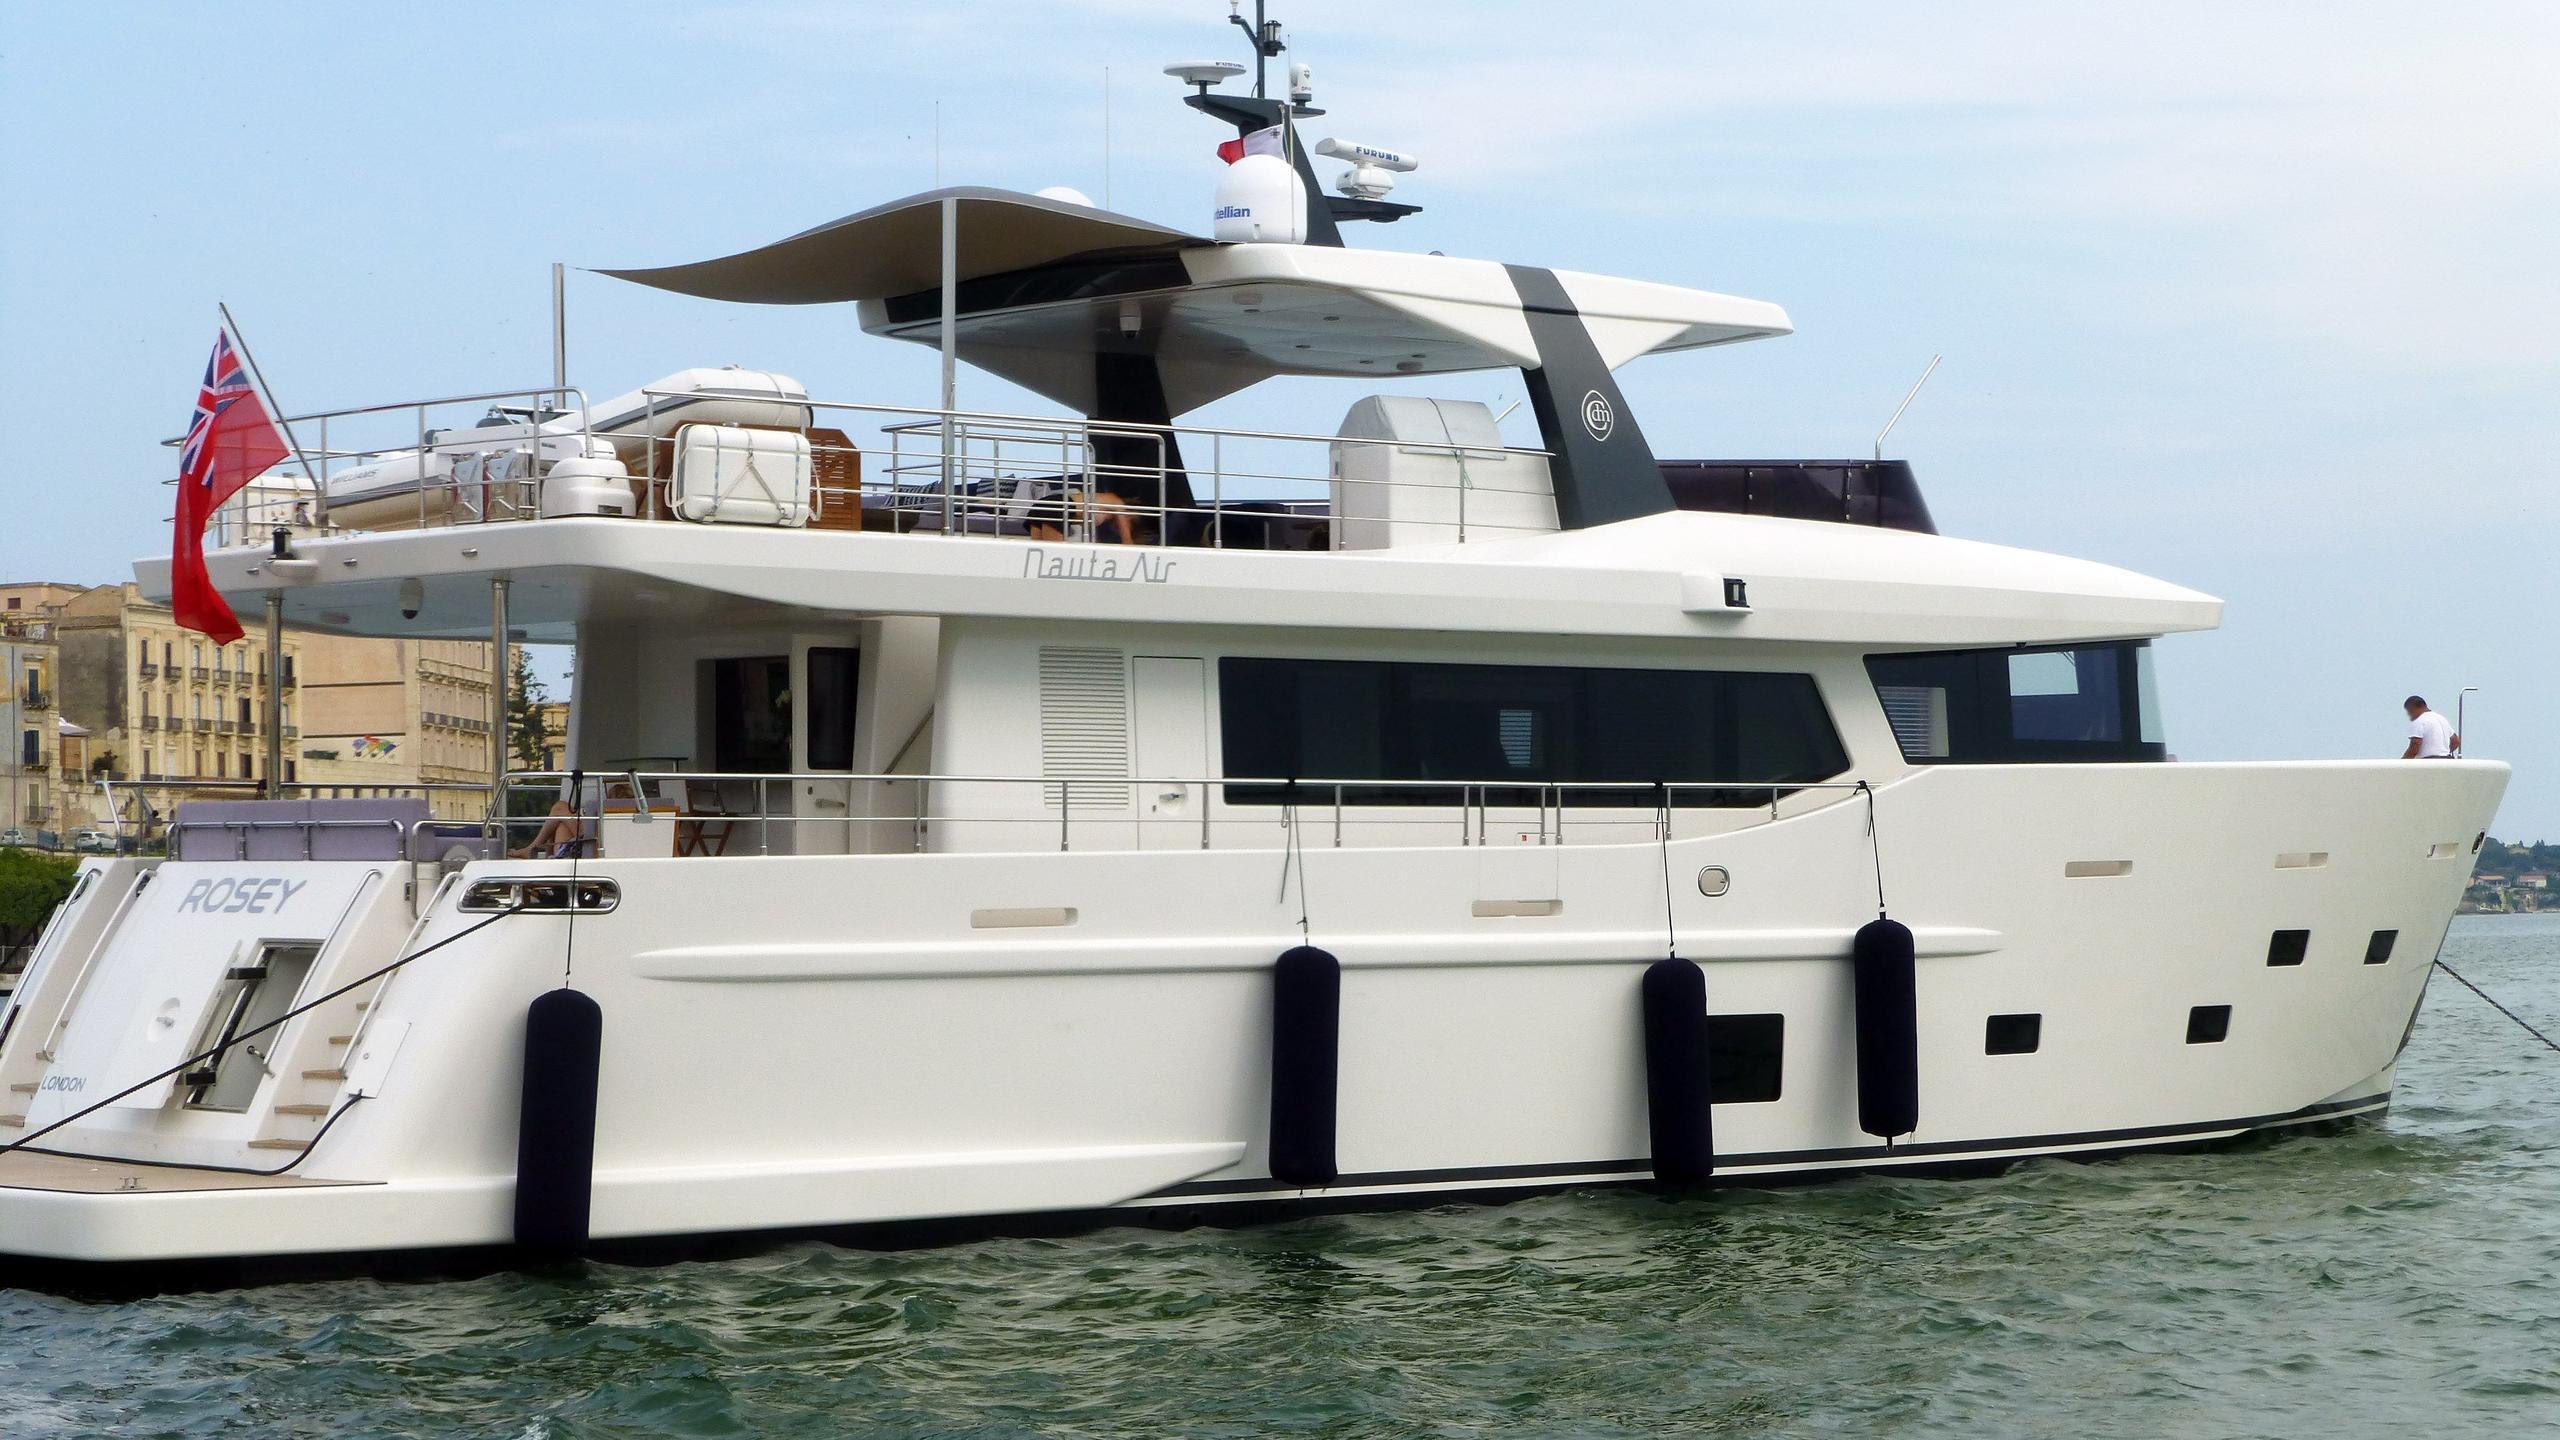 rosey-2015-yacht-exterior